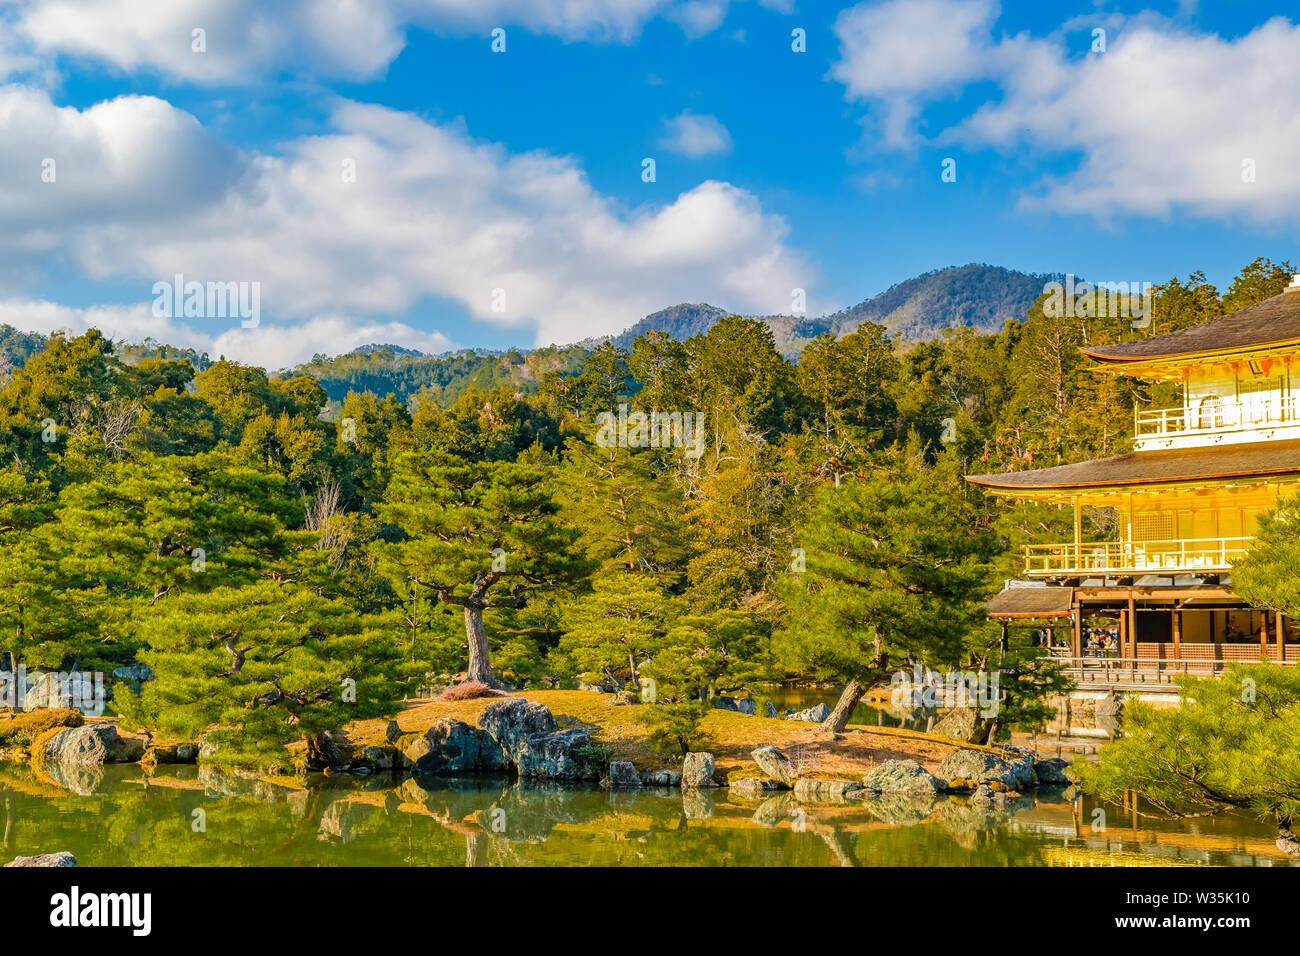 KYOTO, JAPAN, JANUARY - 2019 - Exterior view of famous kinkakuji zen temple at Kyoto city, japan Stock Photo